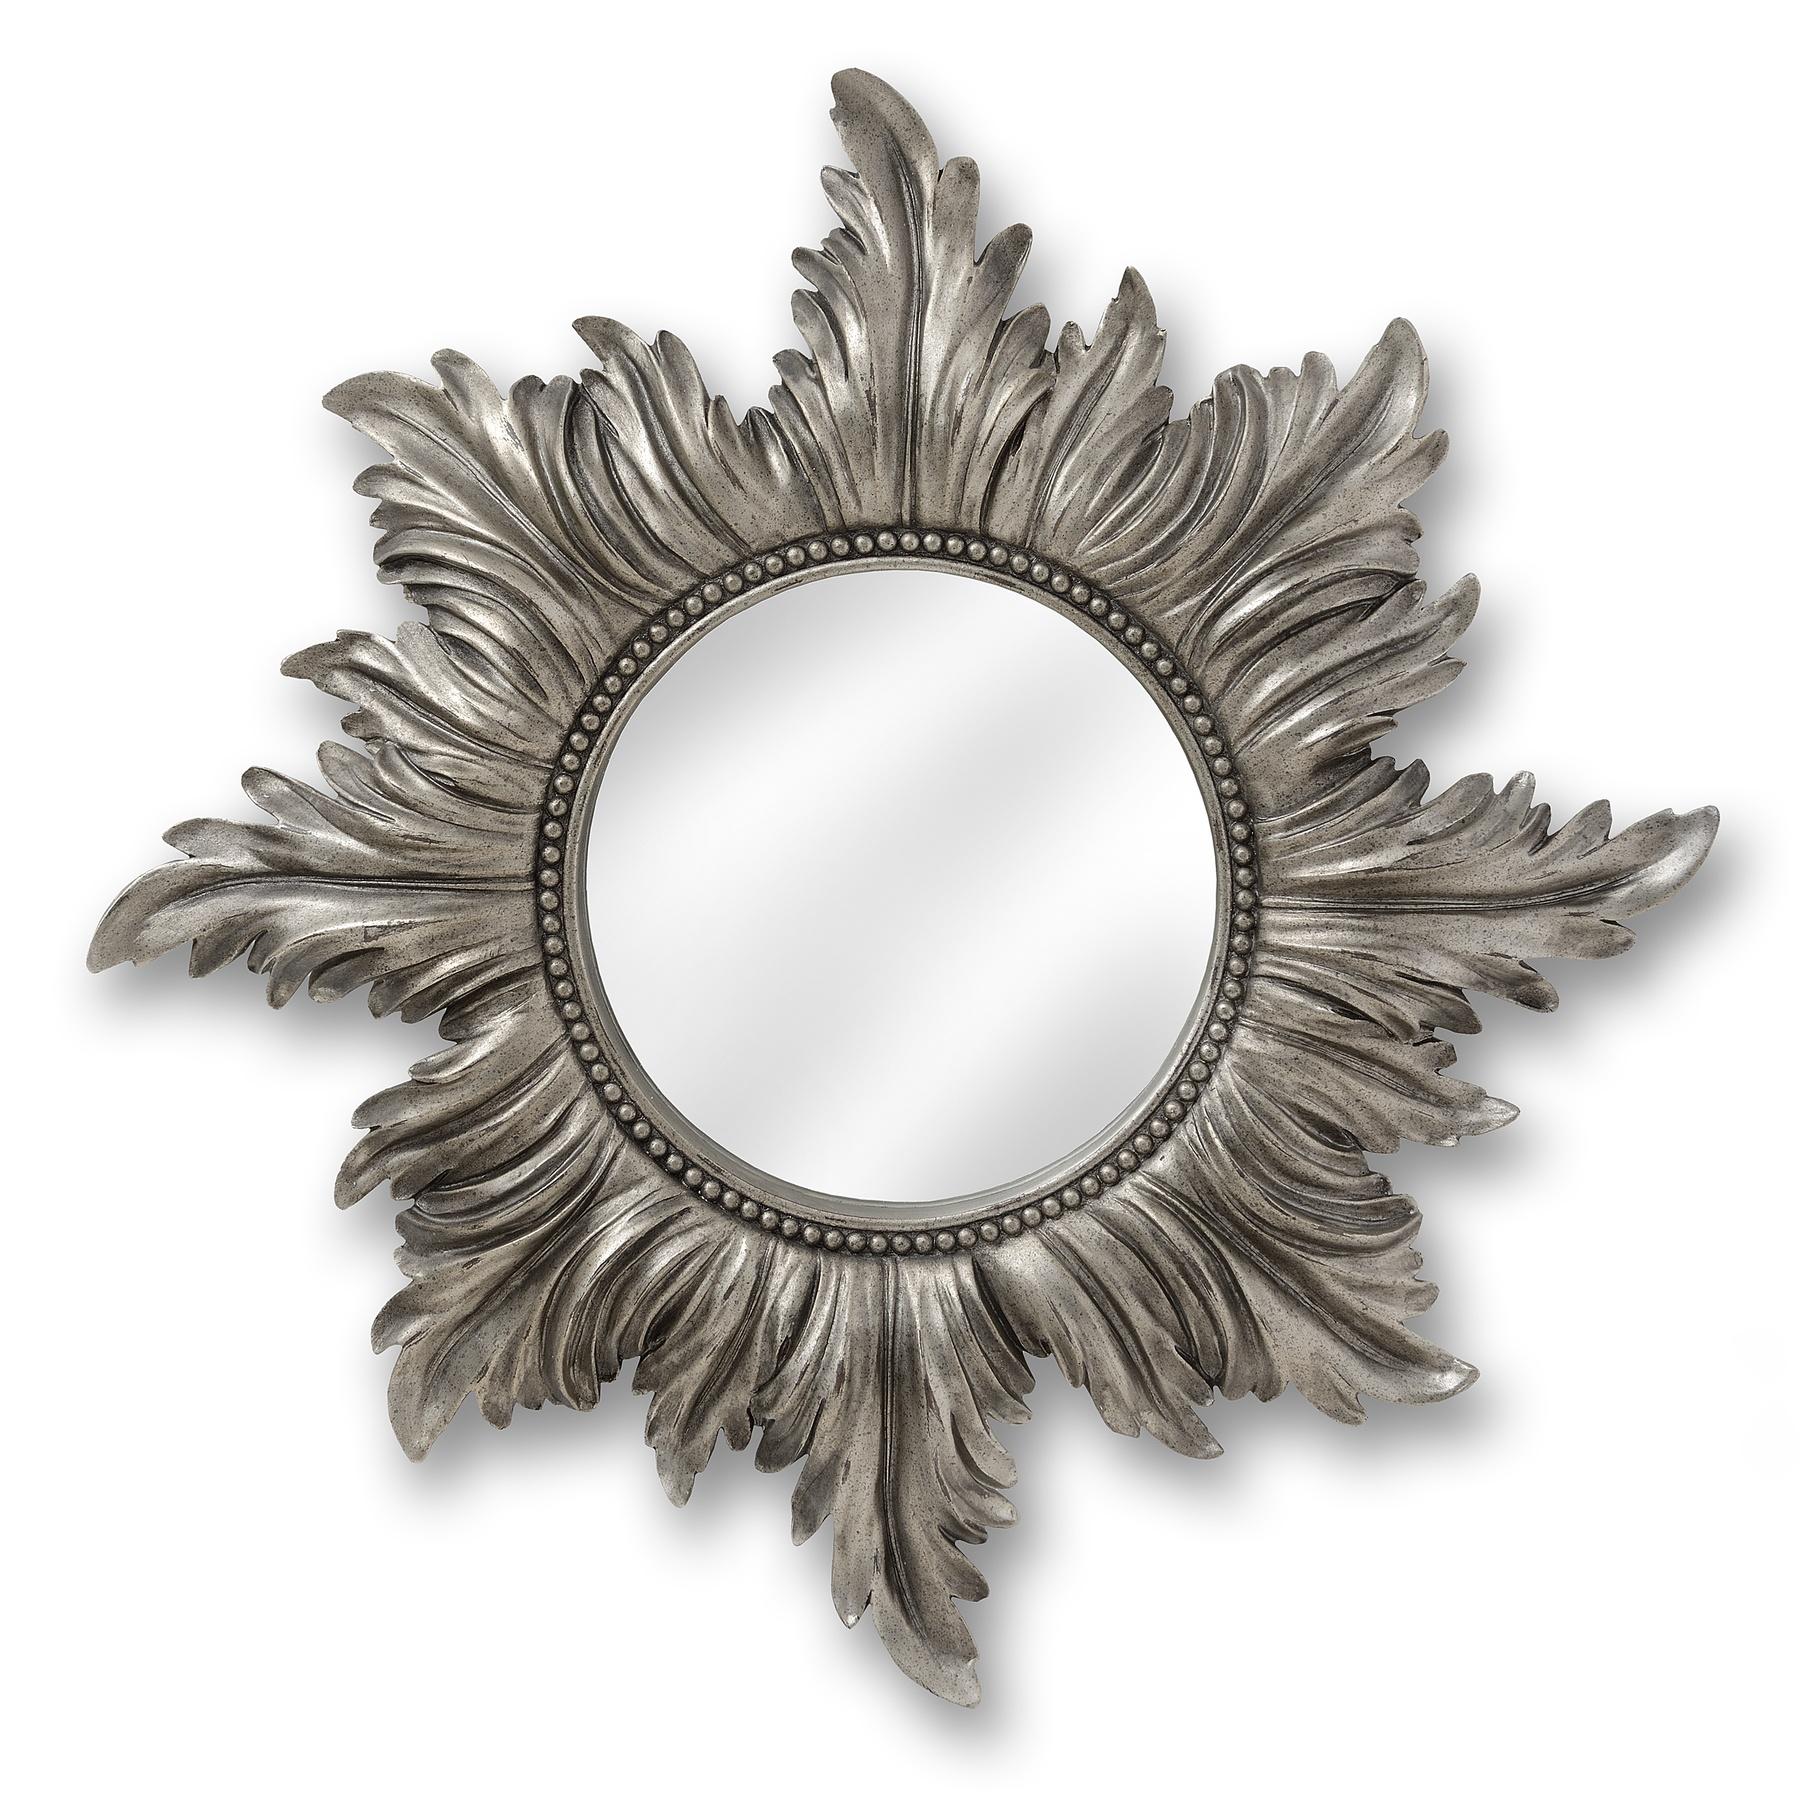 Decorative Antique Silver Star Mirror